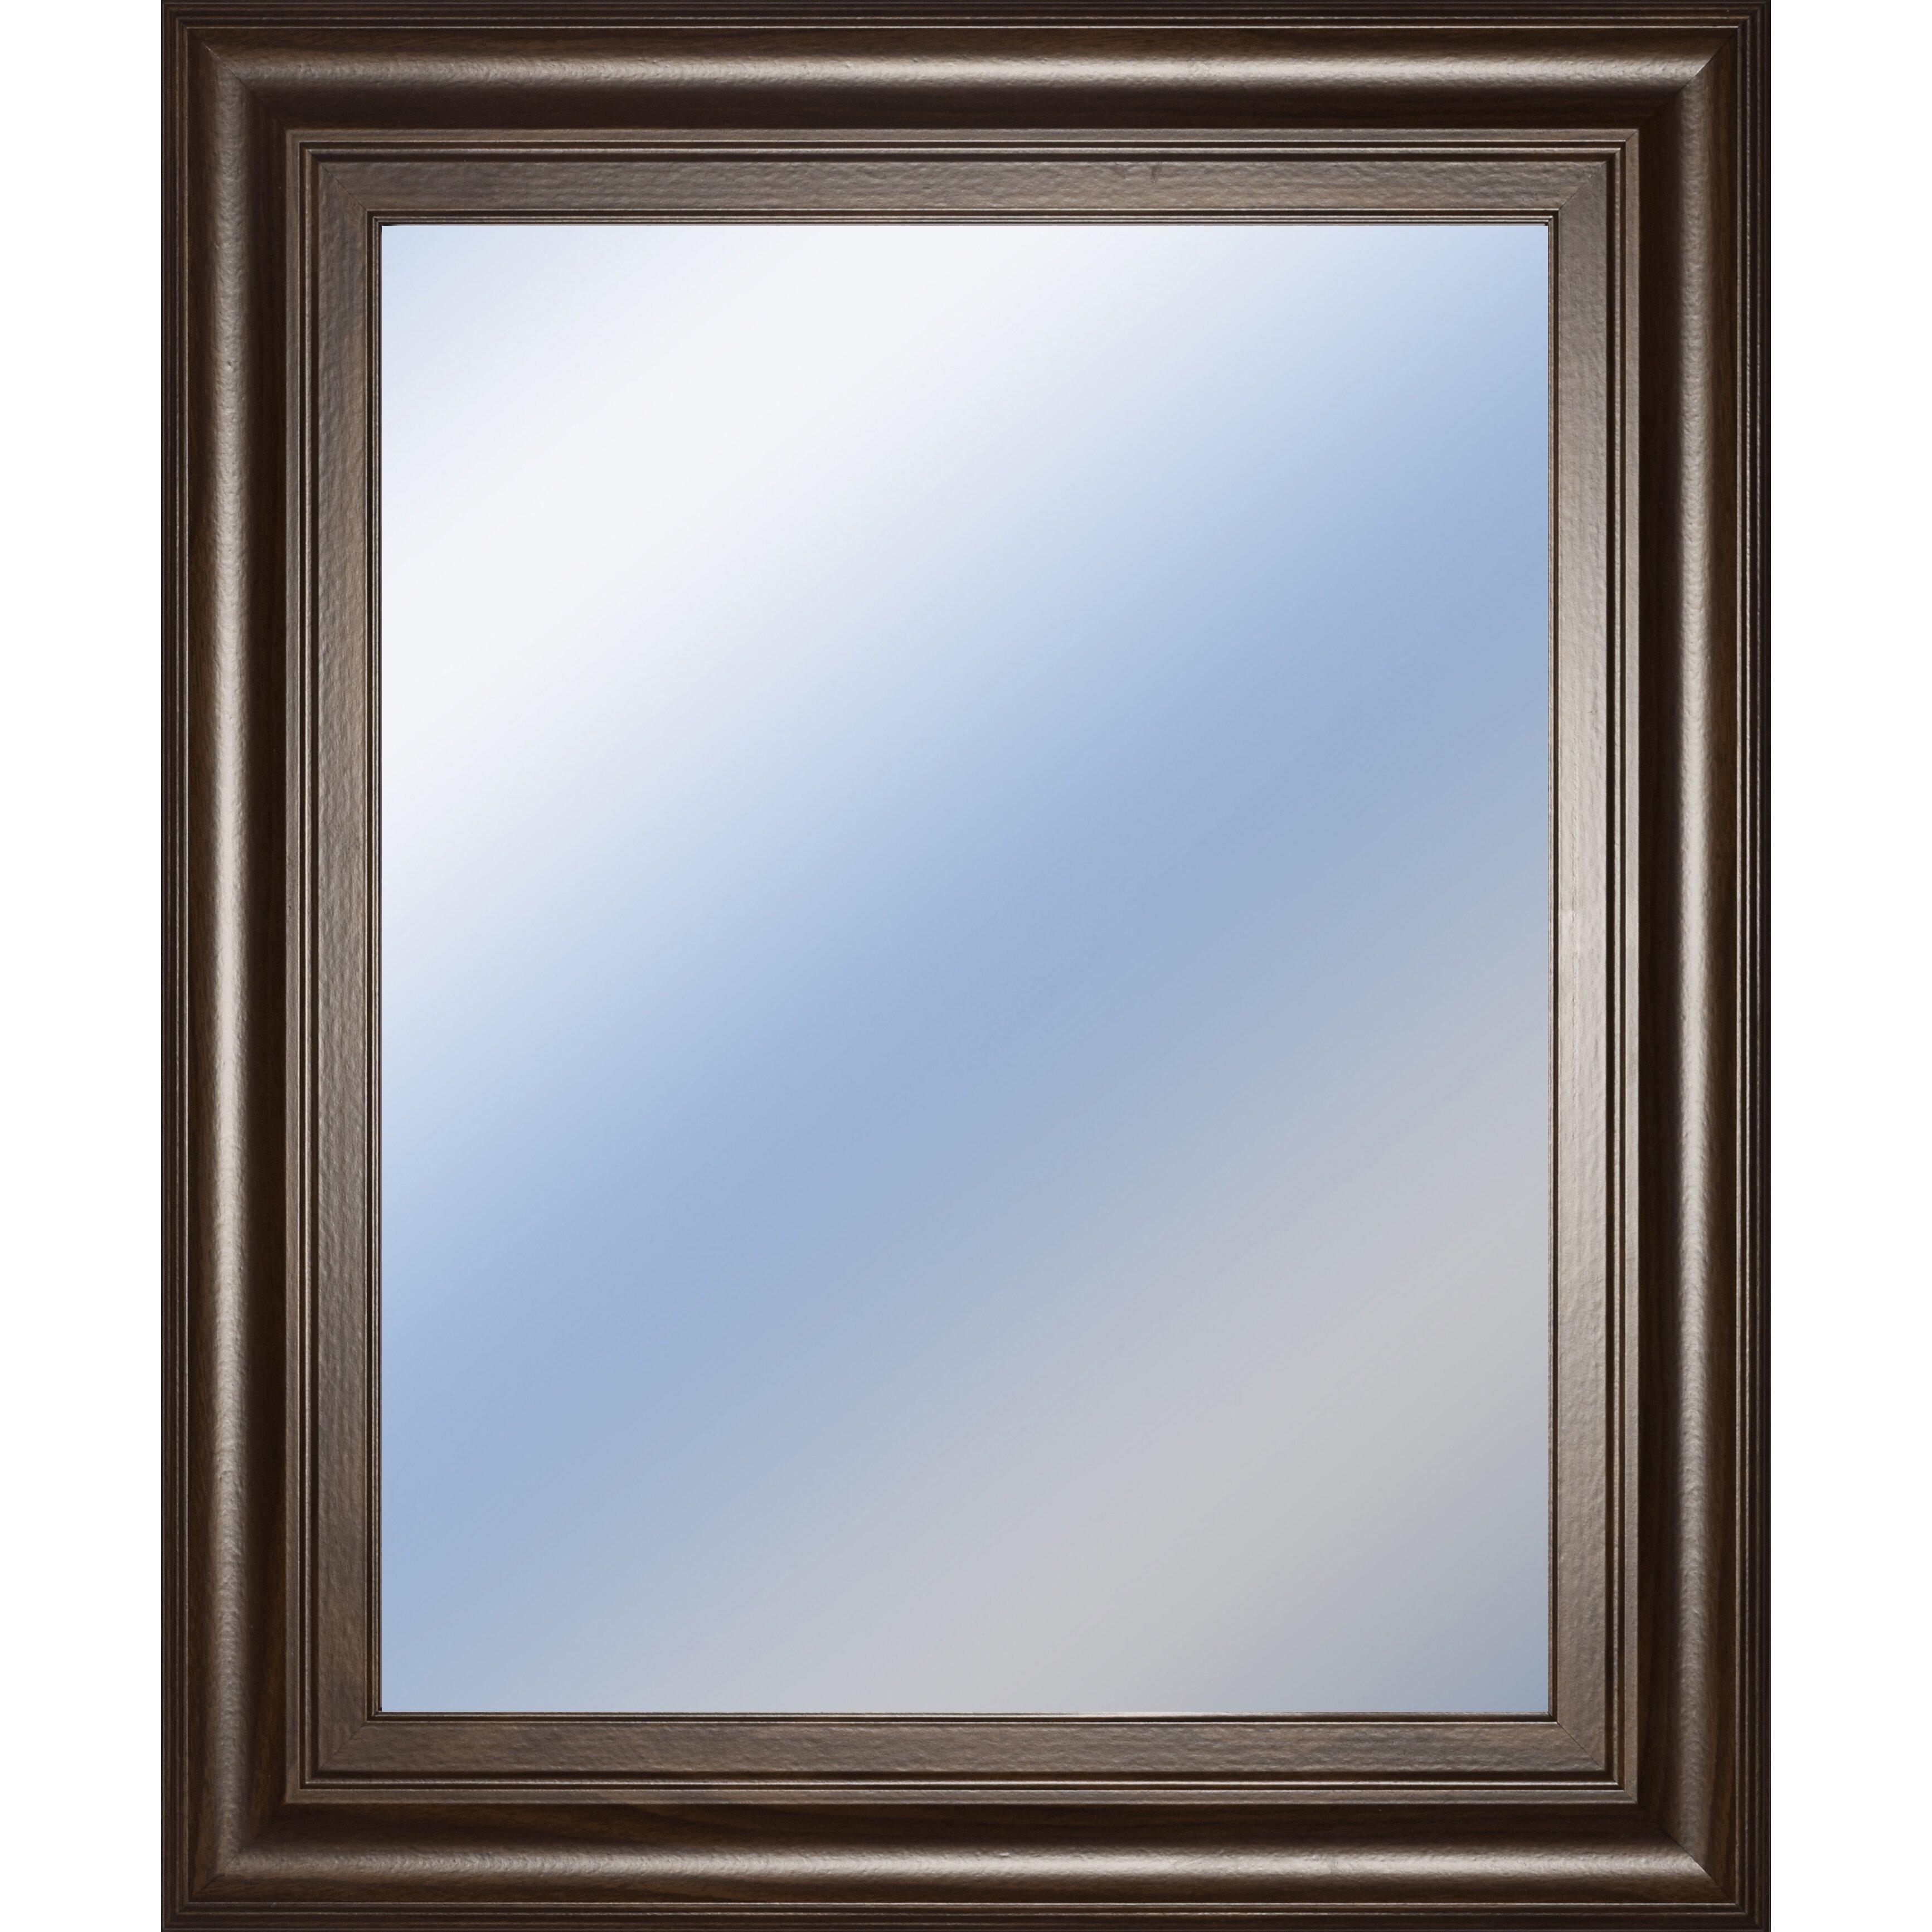 Wall Art With Mirror Frame : Classyartwholesalers decorative framed wall mirror